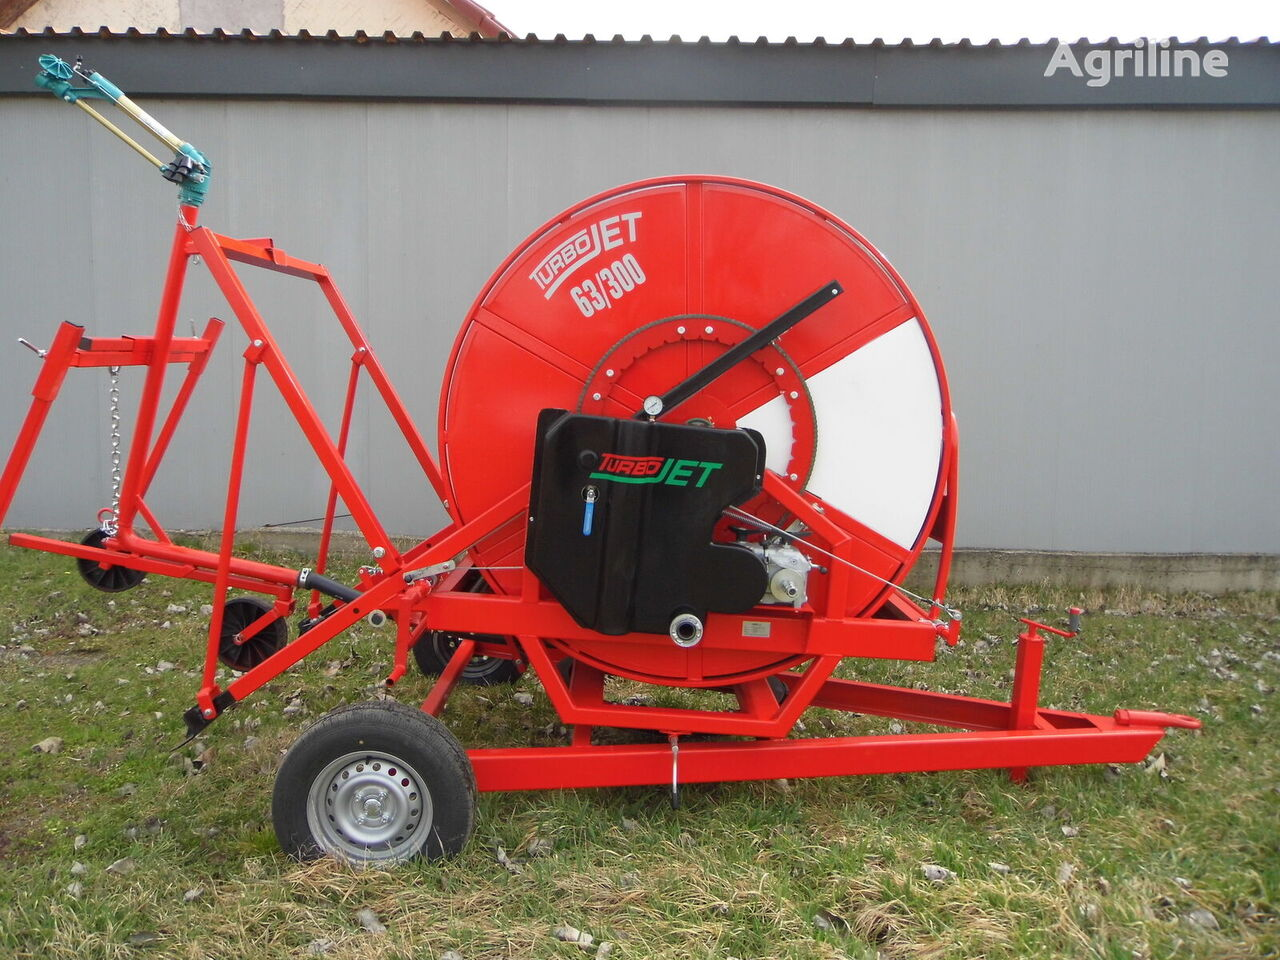 TurboJet 63/300 irrigation machine